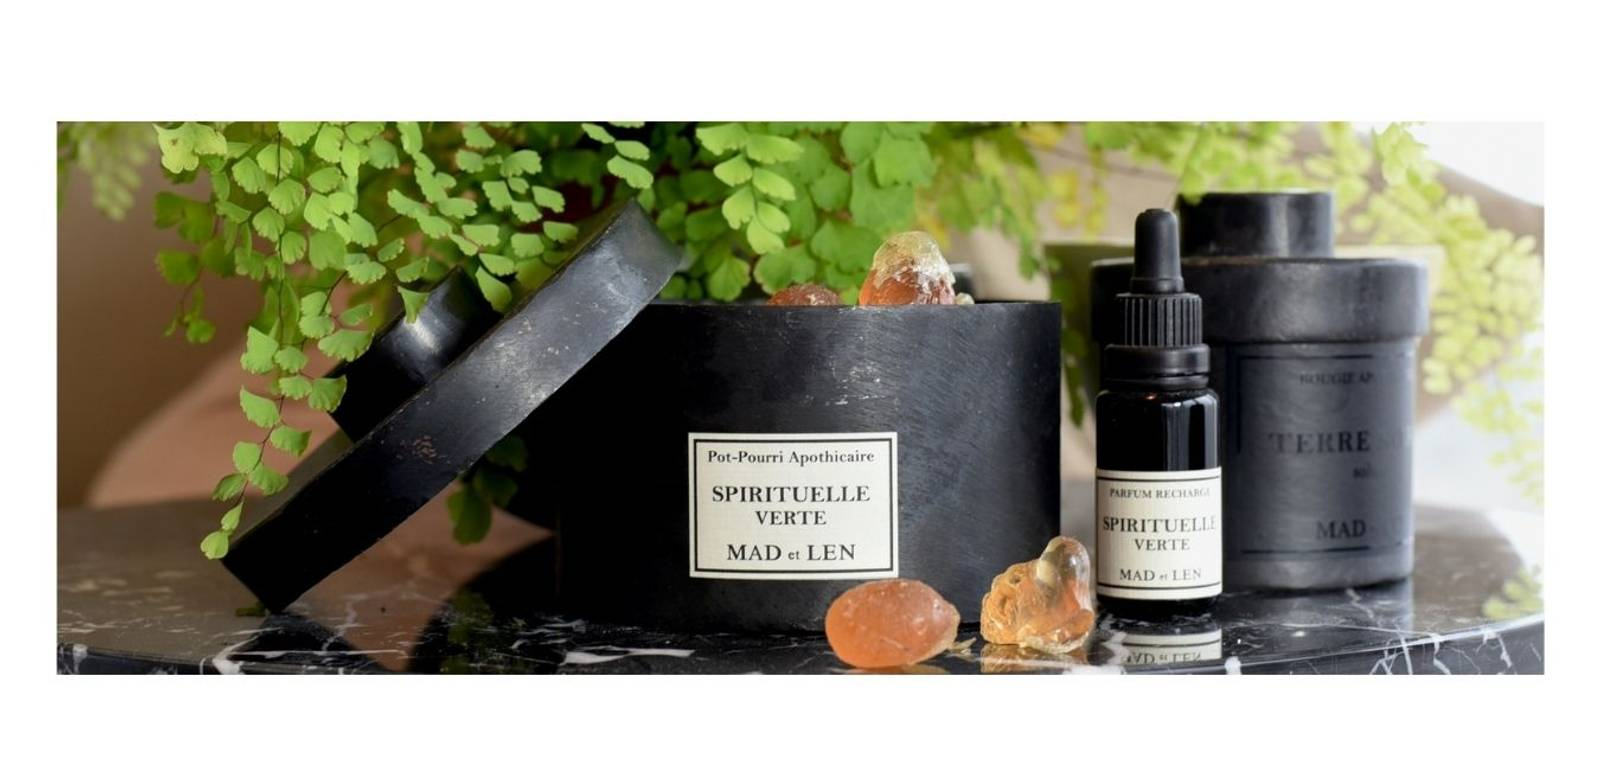 MAD ET LEN duftlys pot pourri crystals krystaller perfume fransk artisanale handmade exclusive